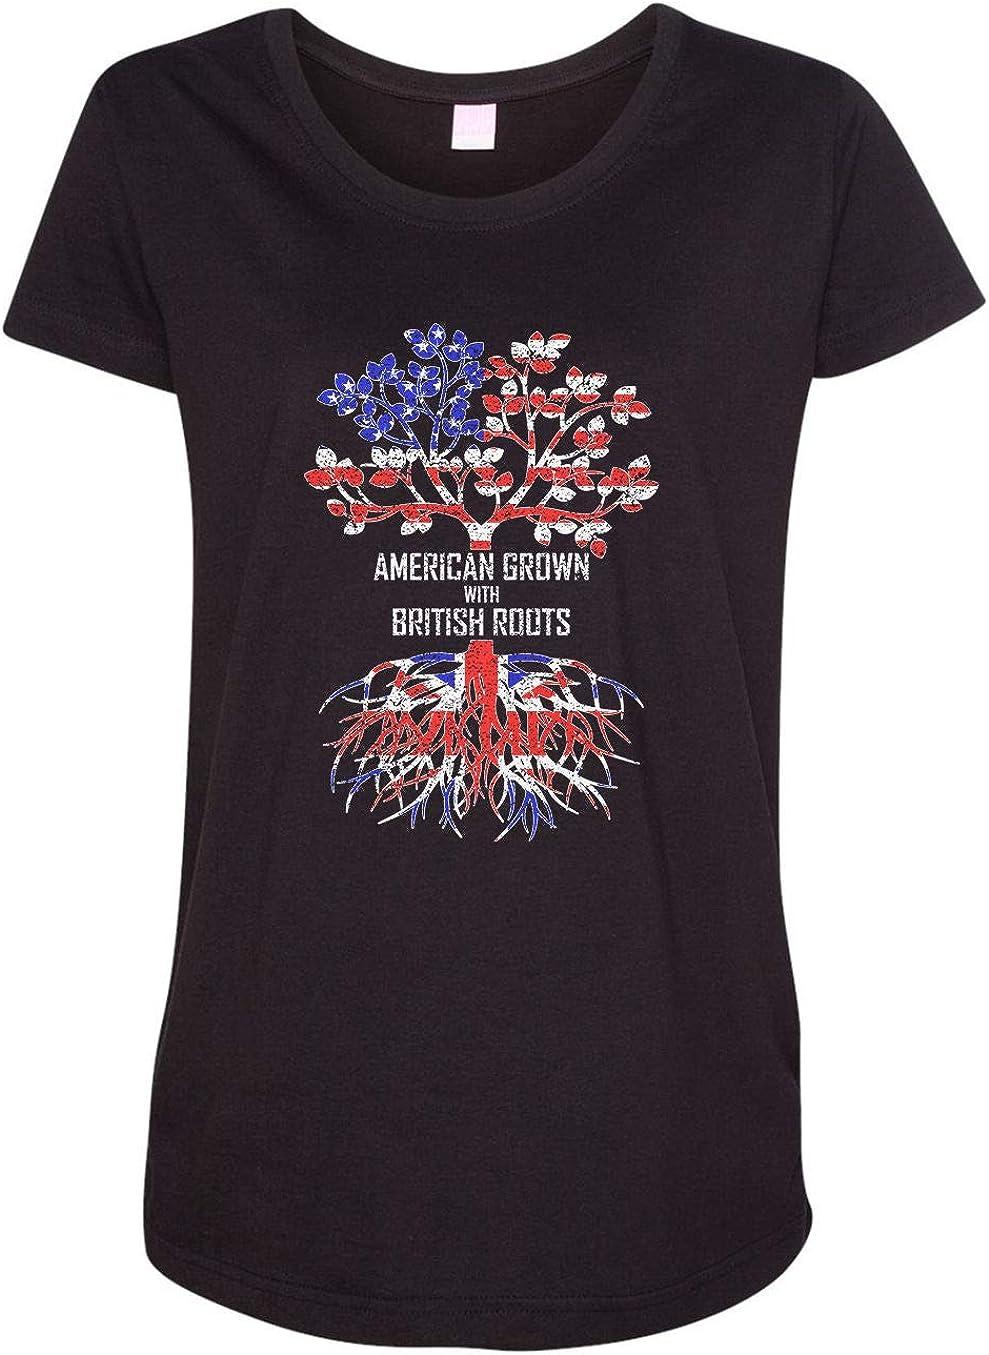 HARD EDGE DESIGN Women's American Grown with British Roots T-Shirt